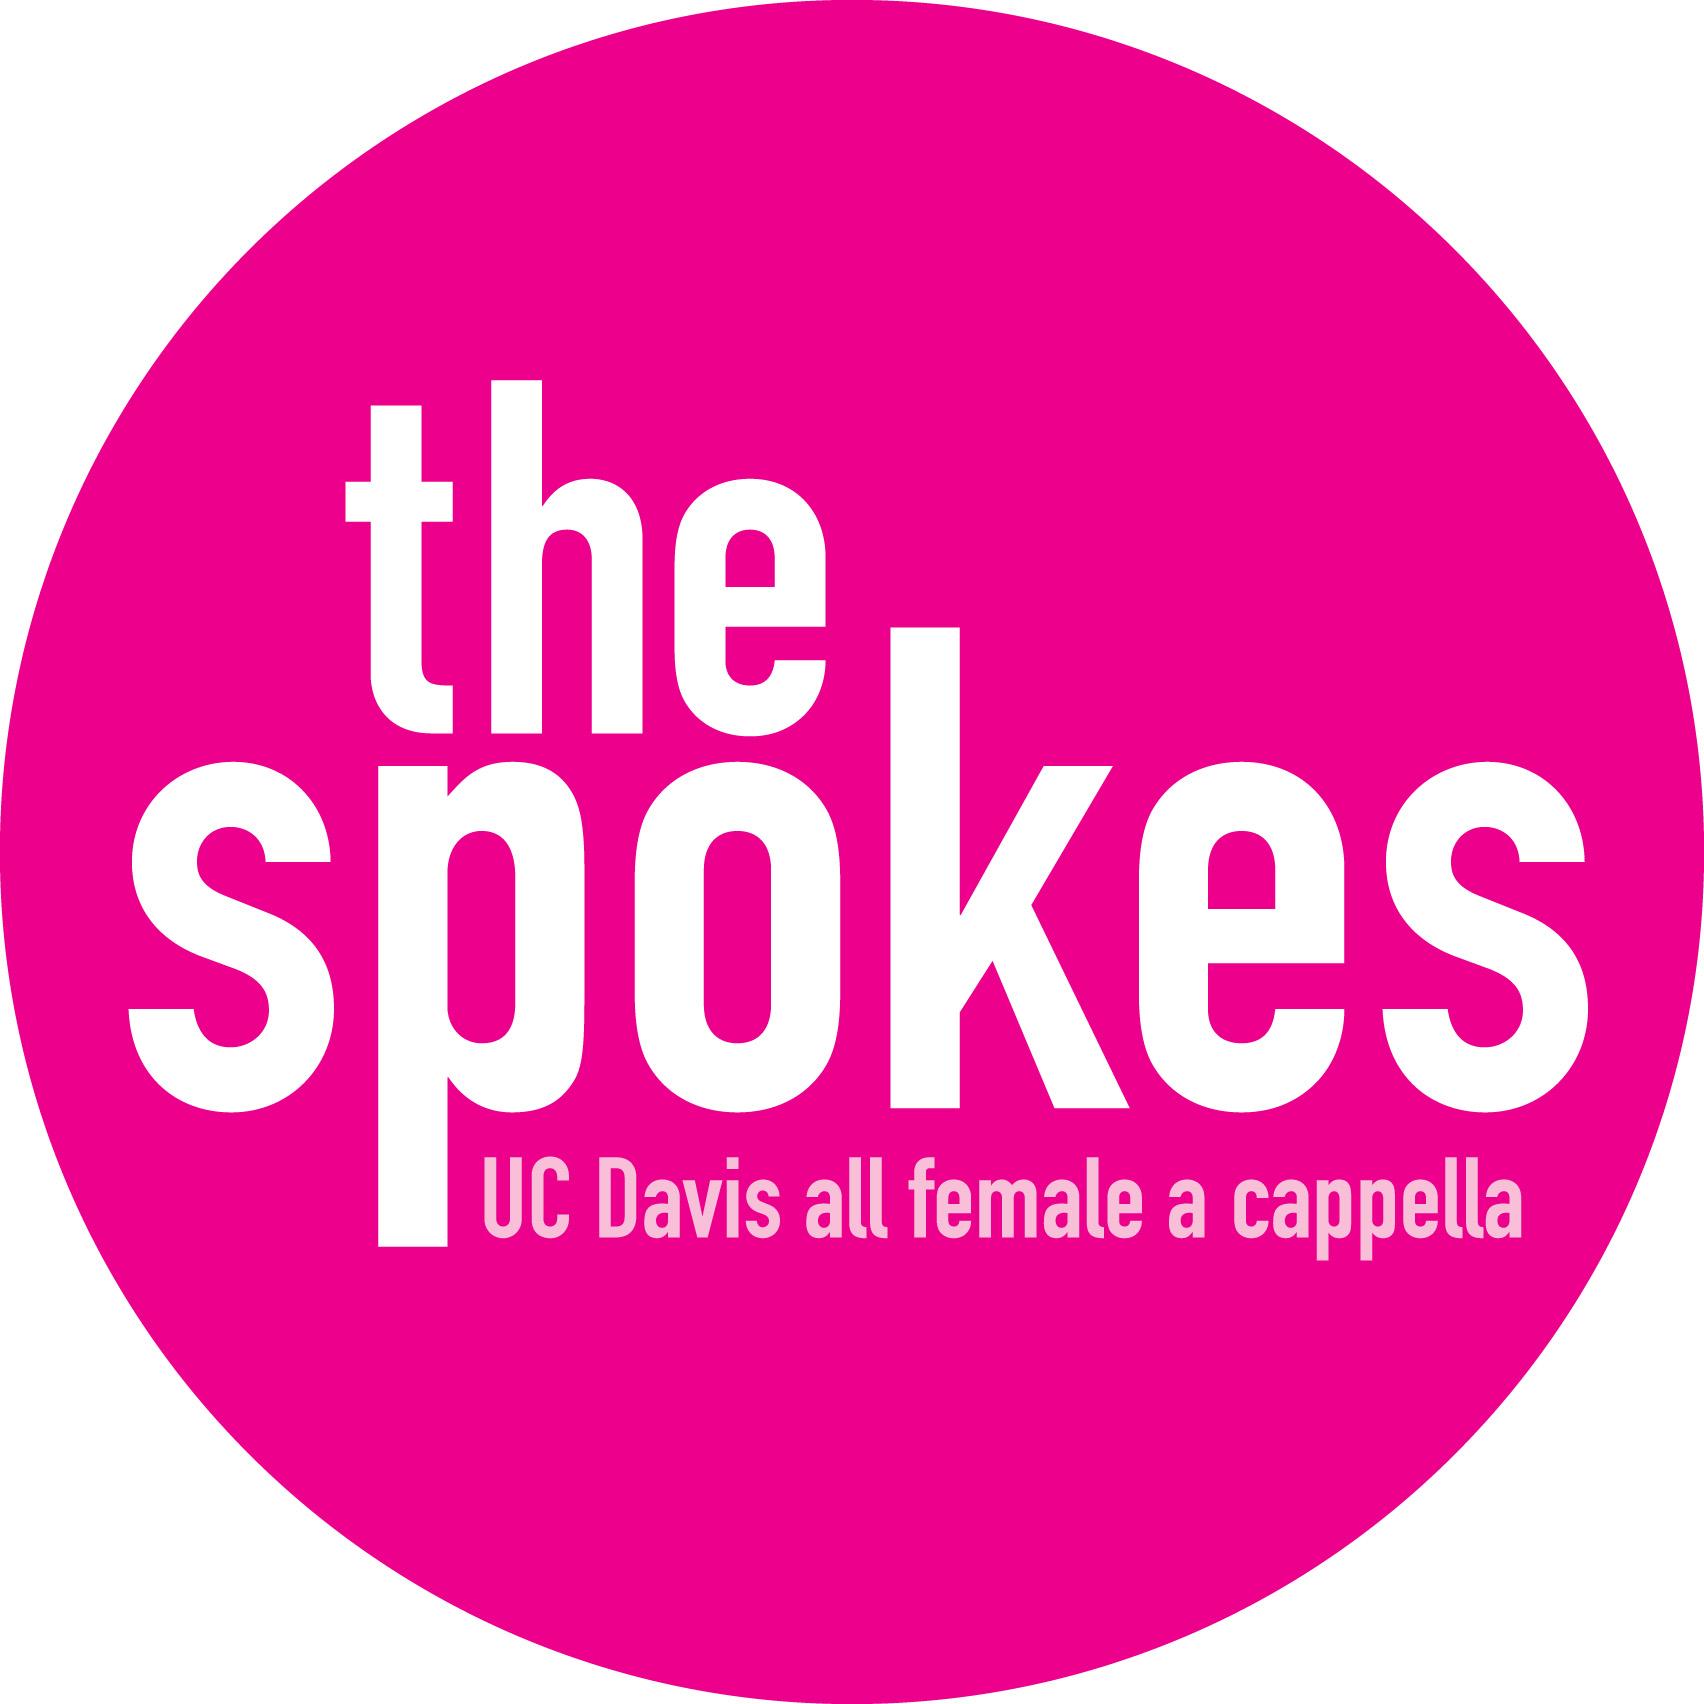 The Spokes - Wikipedia